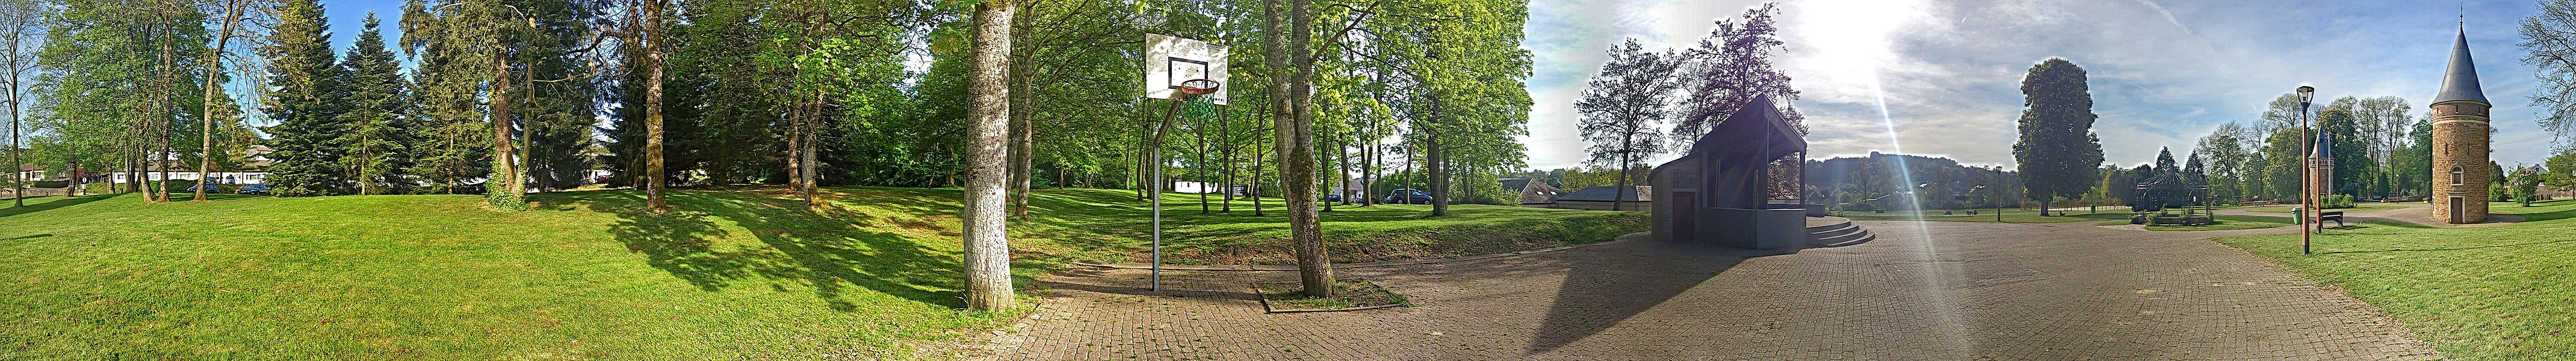 Parc Mathelin